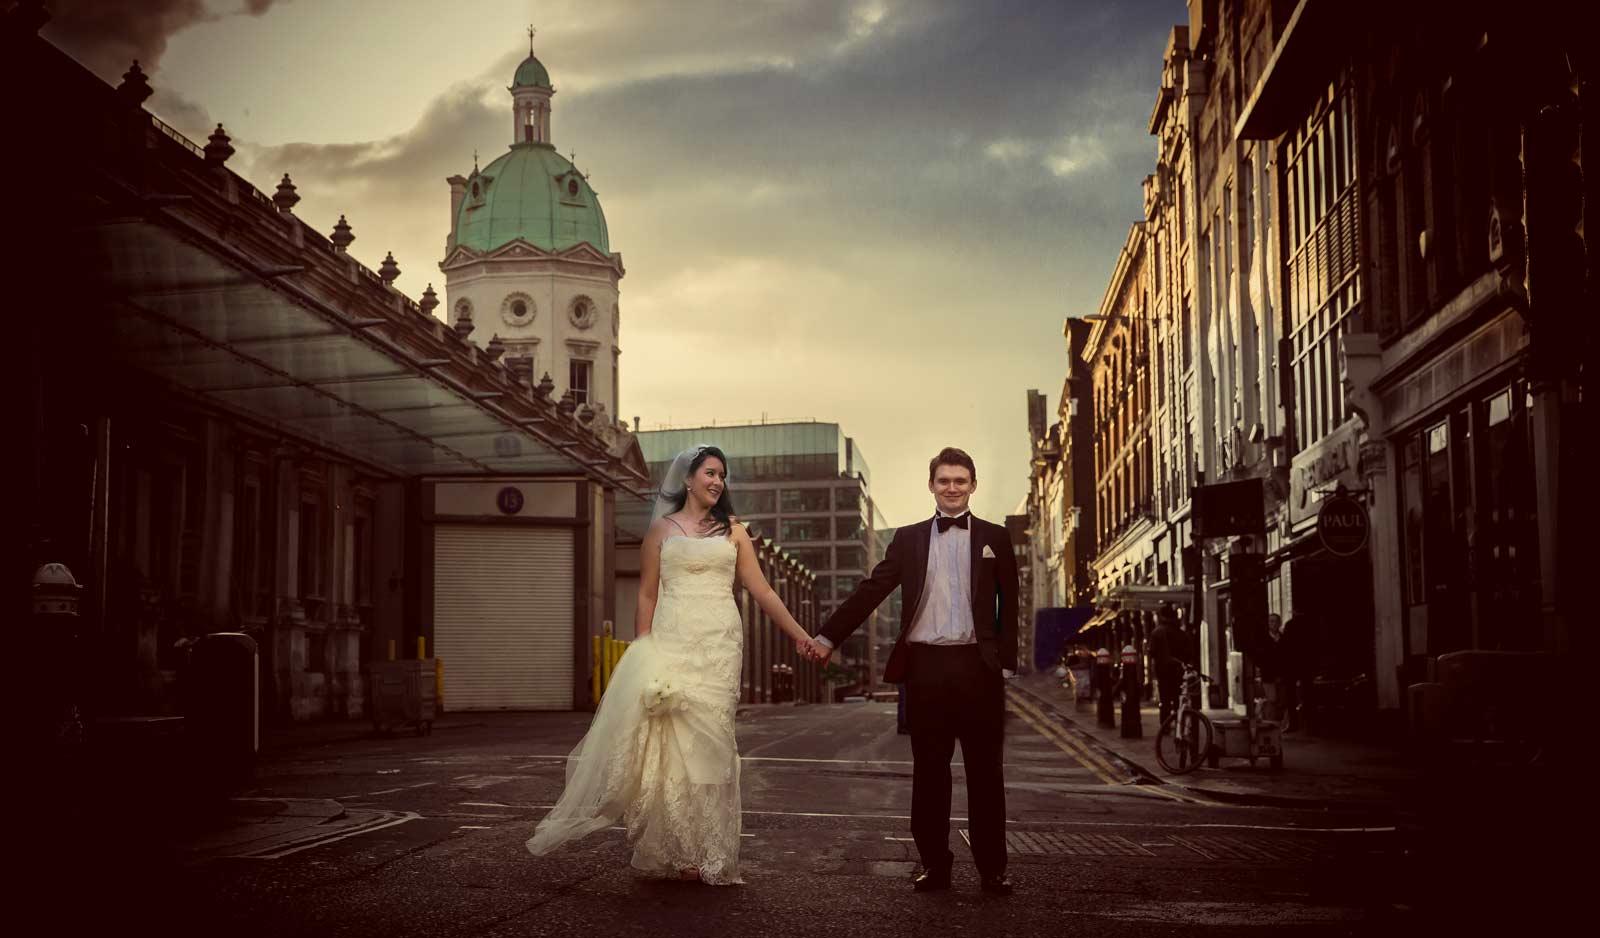 wedding by Smithfield market image